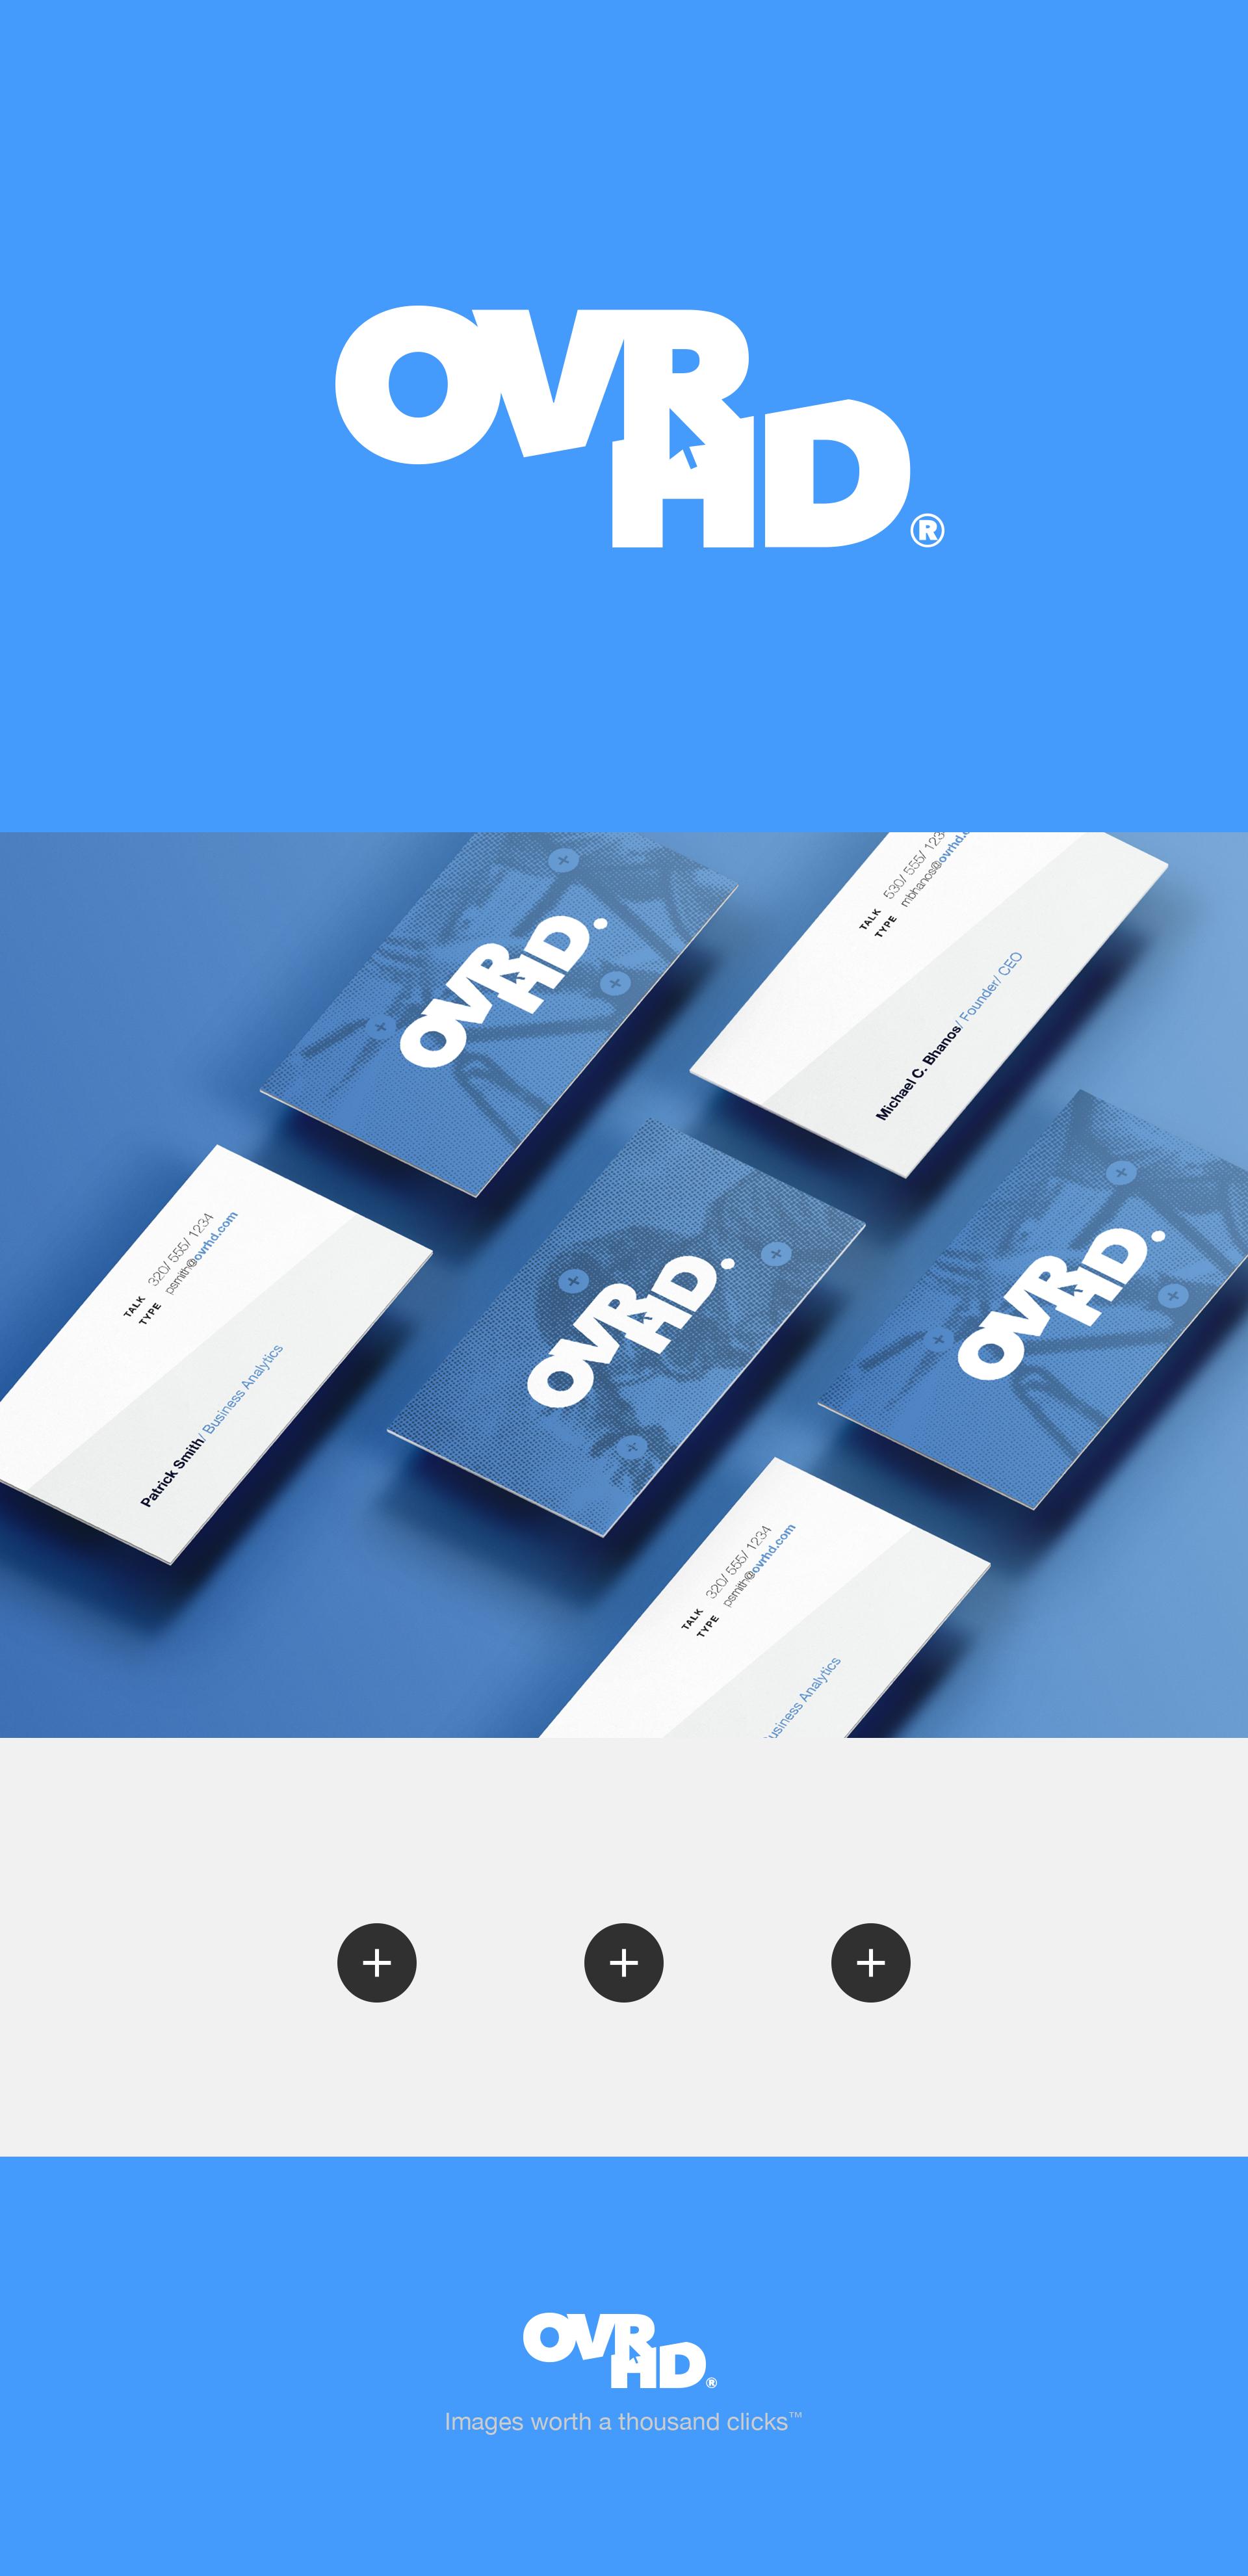 OVR HD Brand Identity